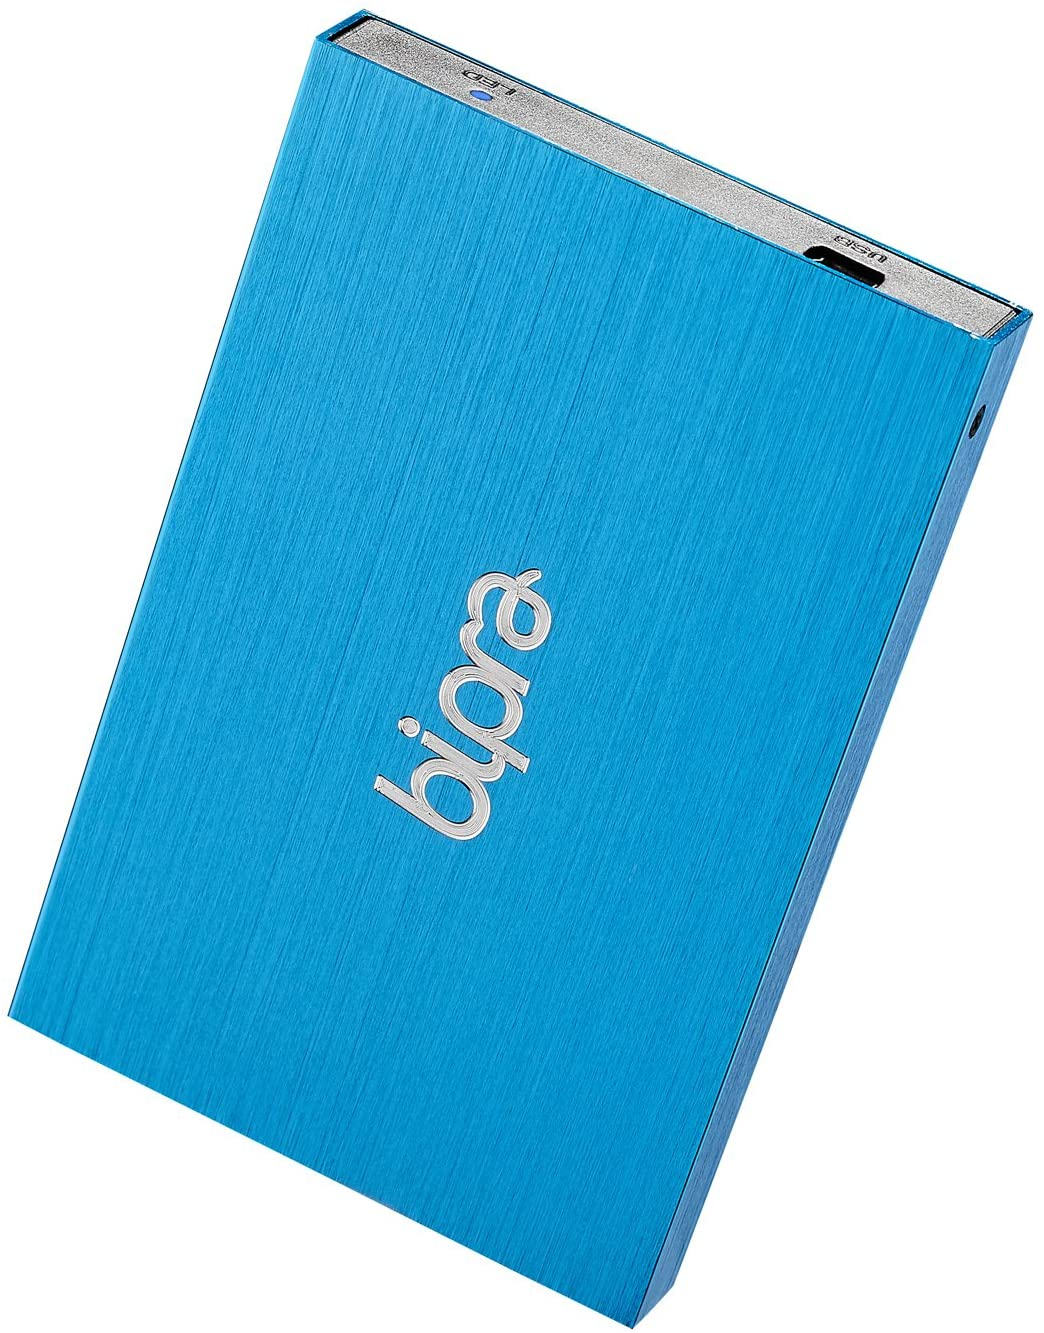 Bipra 2.5 Inch External Hard Drive Portable USB 2.0 - Blue - FAT32 (250GB)